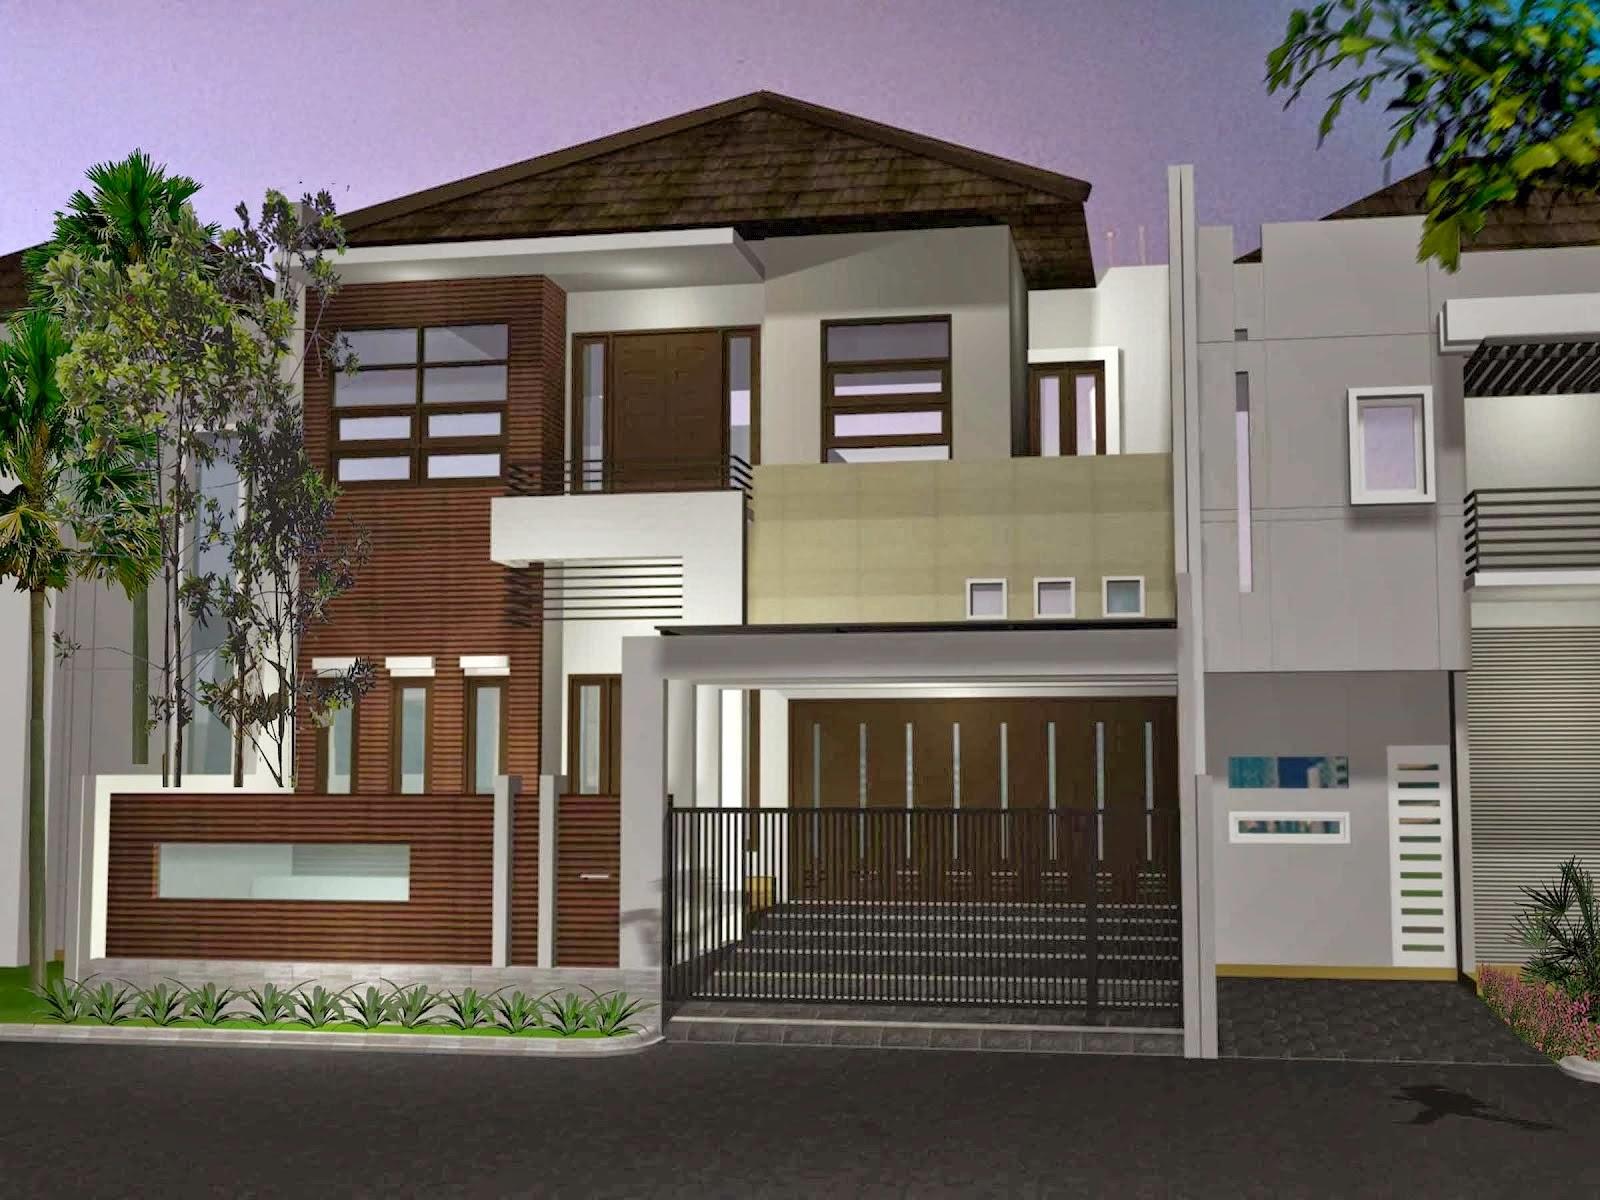 Desain Rumah Minimalis Modern 2 Lantai Sangat Anggun 100 Rumah